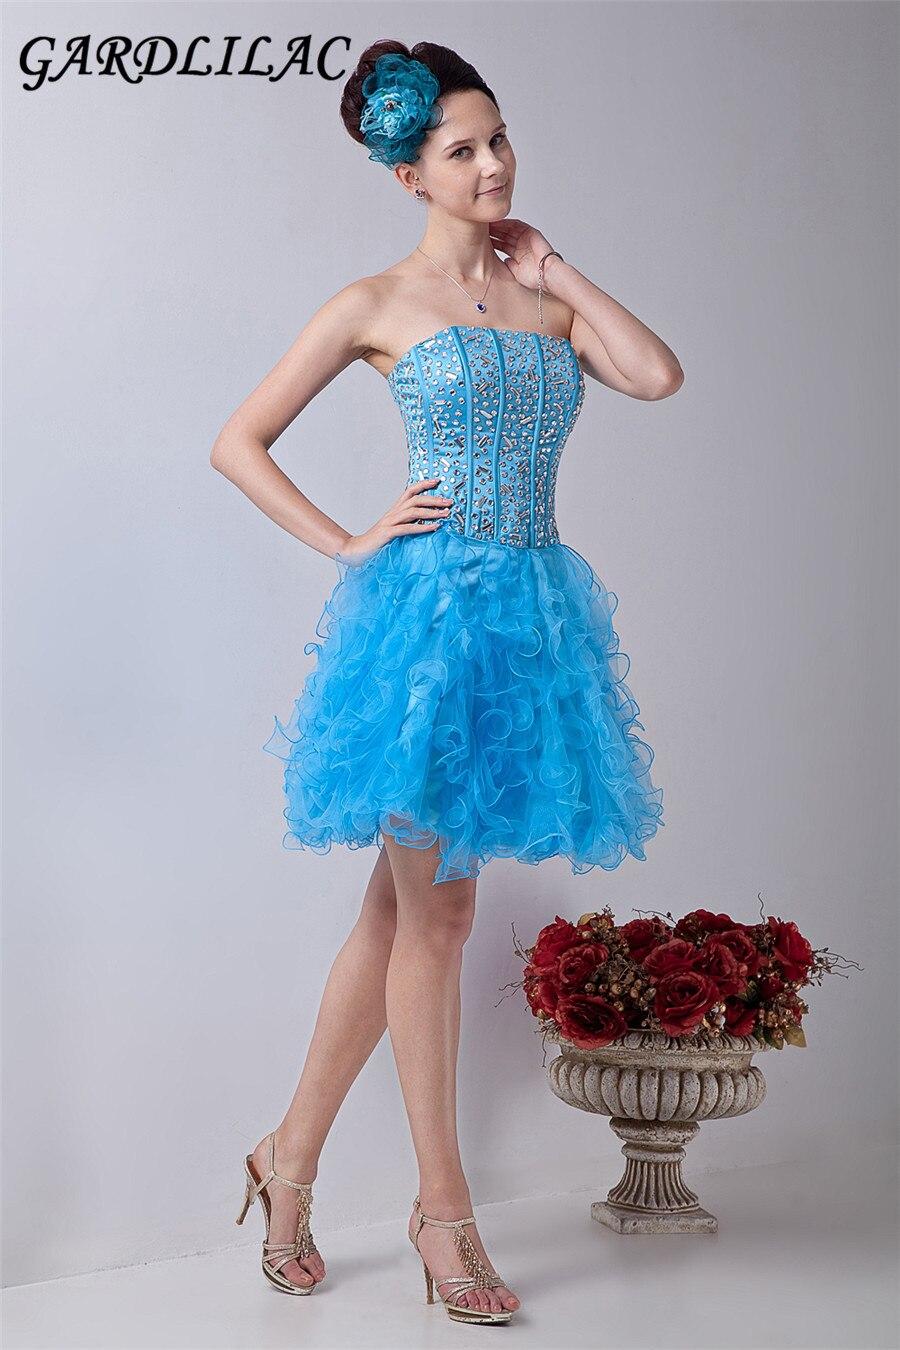 2017 echt bild blau tüll ballkleider kurze abendkleider abendkleider online partykleider vestidos de festa party dress